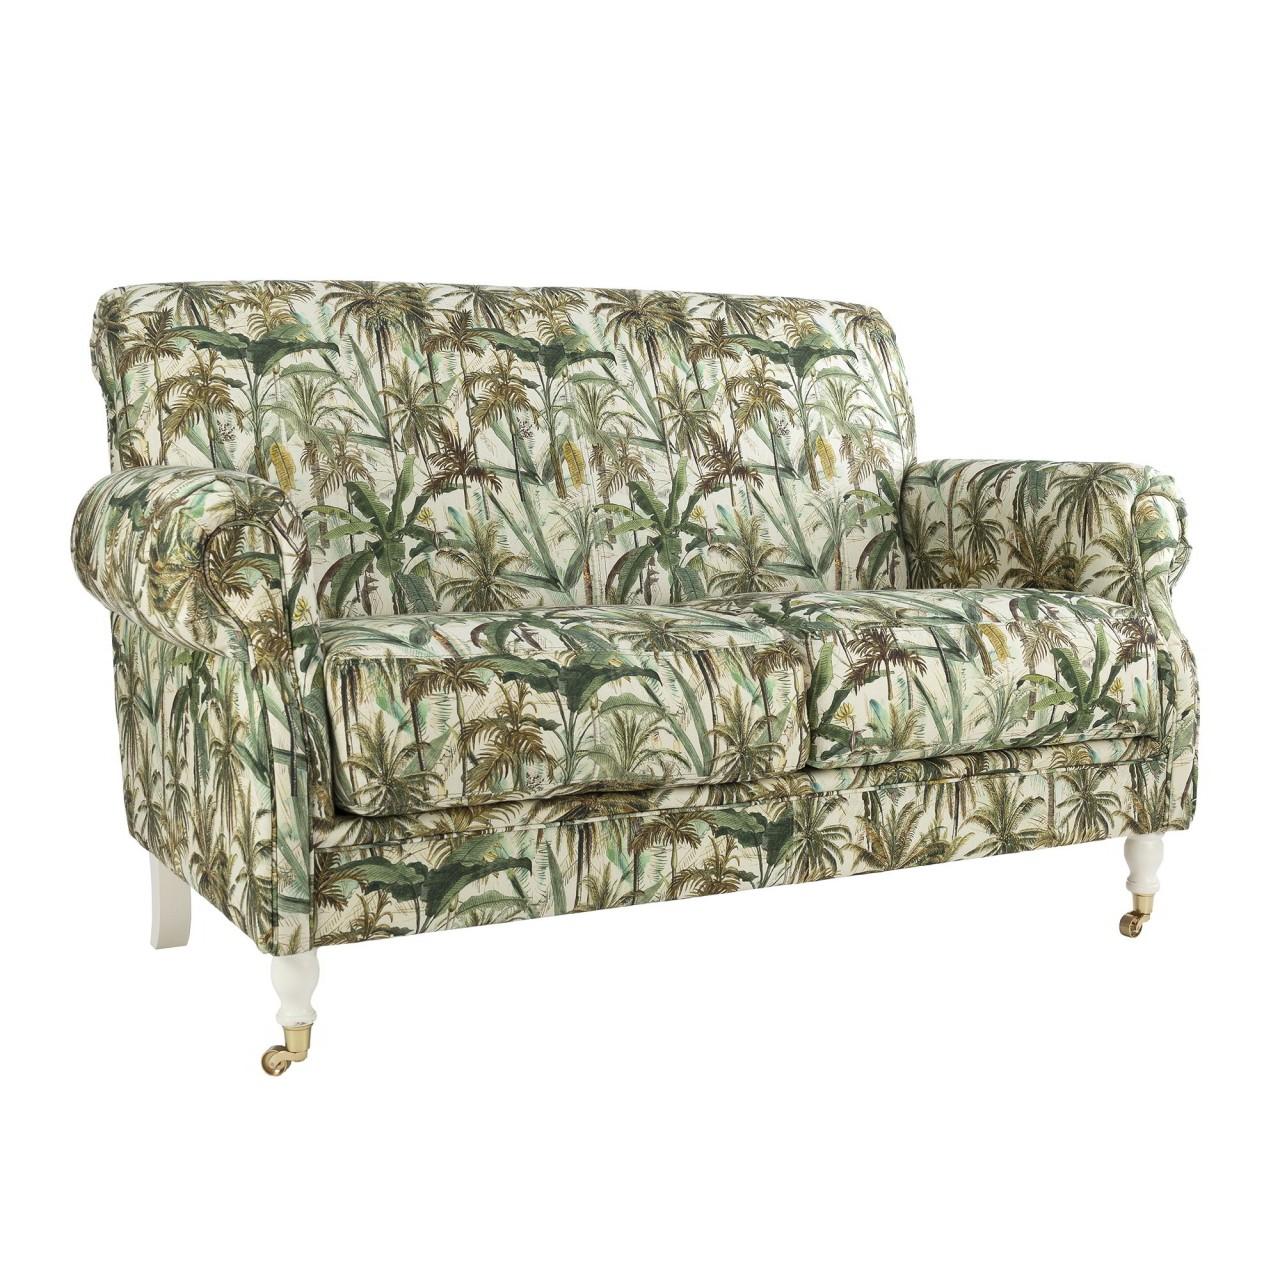 EDINBURGH Sofa - THE JUNGLE Linen